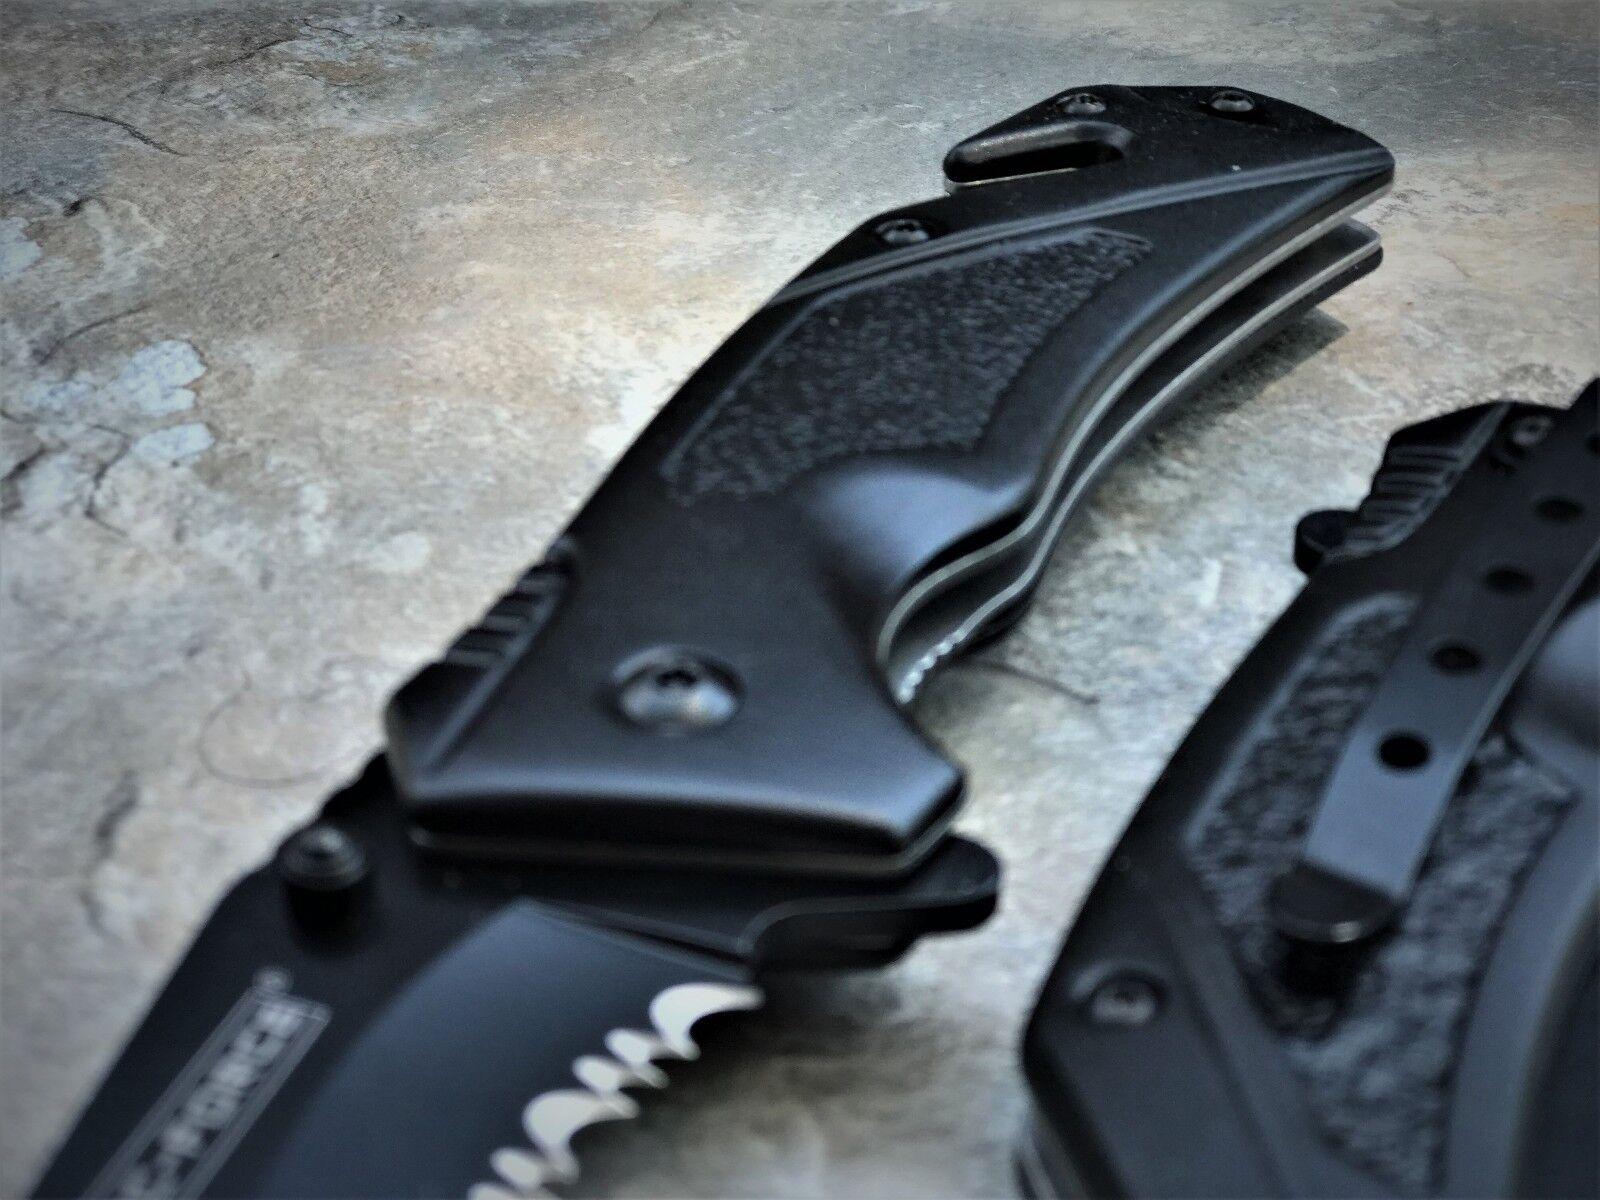 "TAC FORCE SPRING ASSISTED TACTICAL TANTO BLADE FOLDING RESCUE POCKET KNIFE 8.25"""